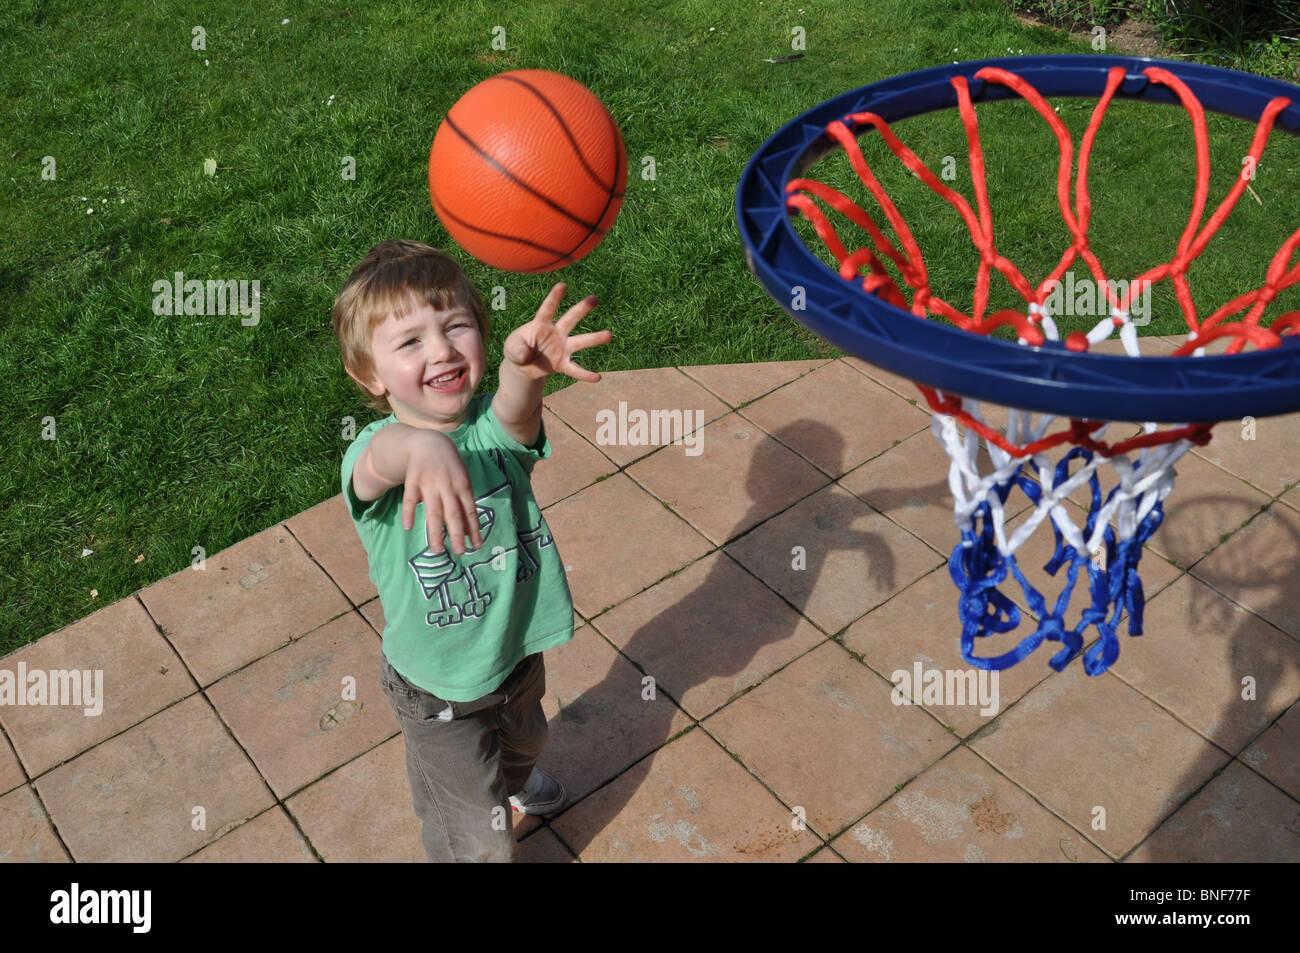 Boy a jugar baloncesto Imagen De Stock